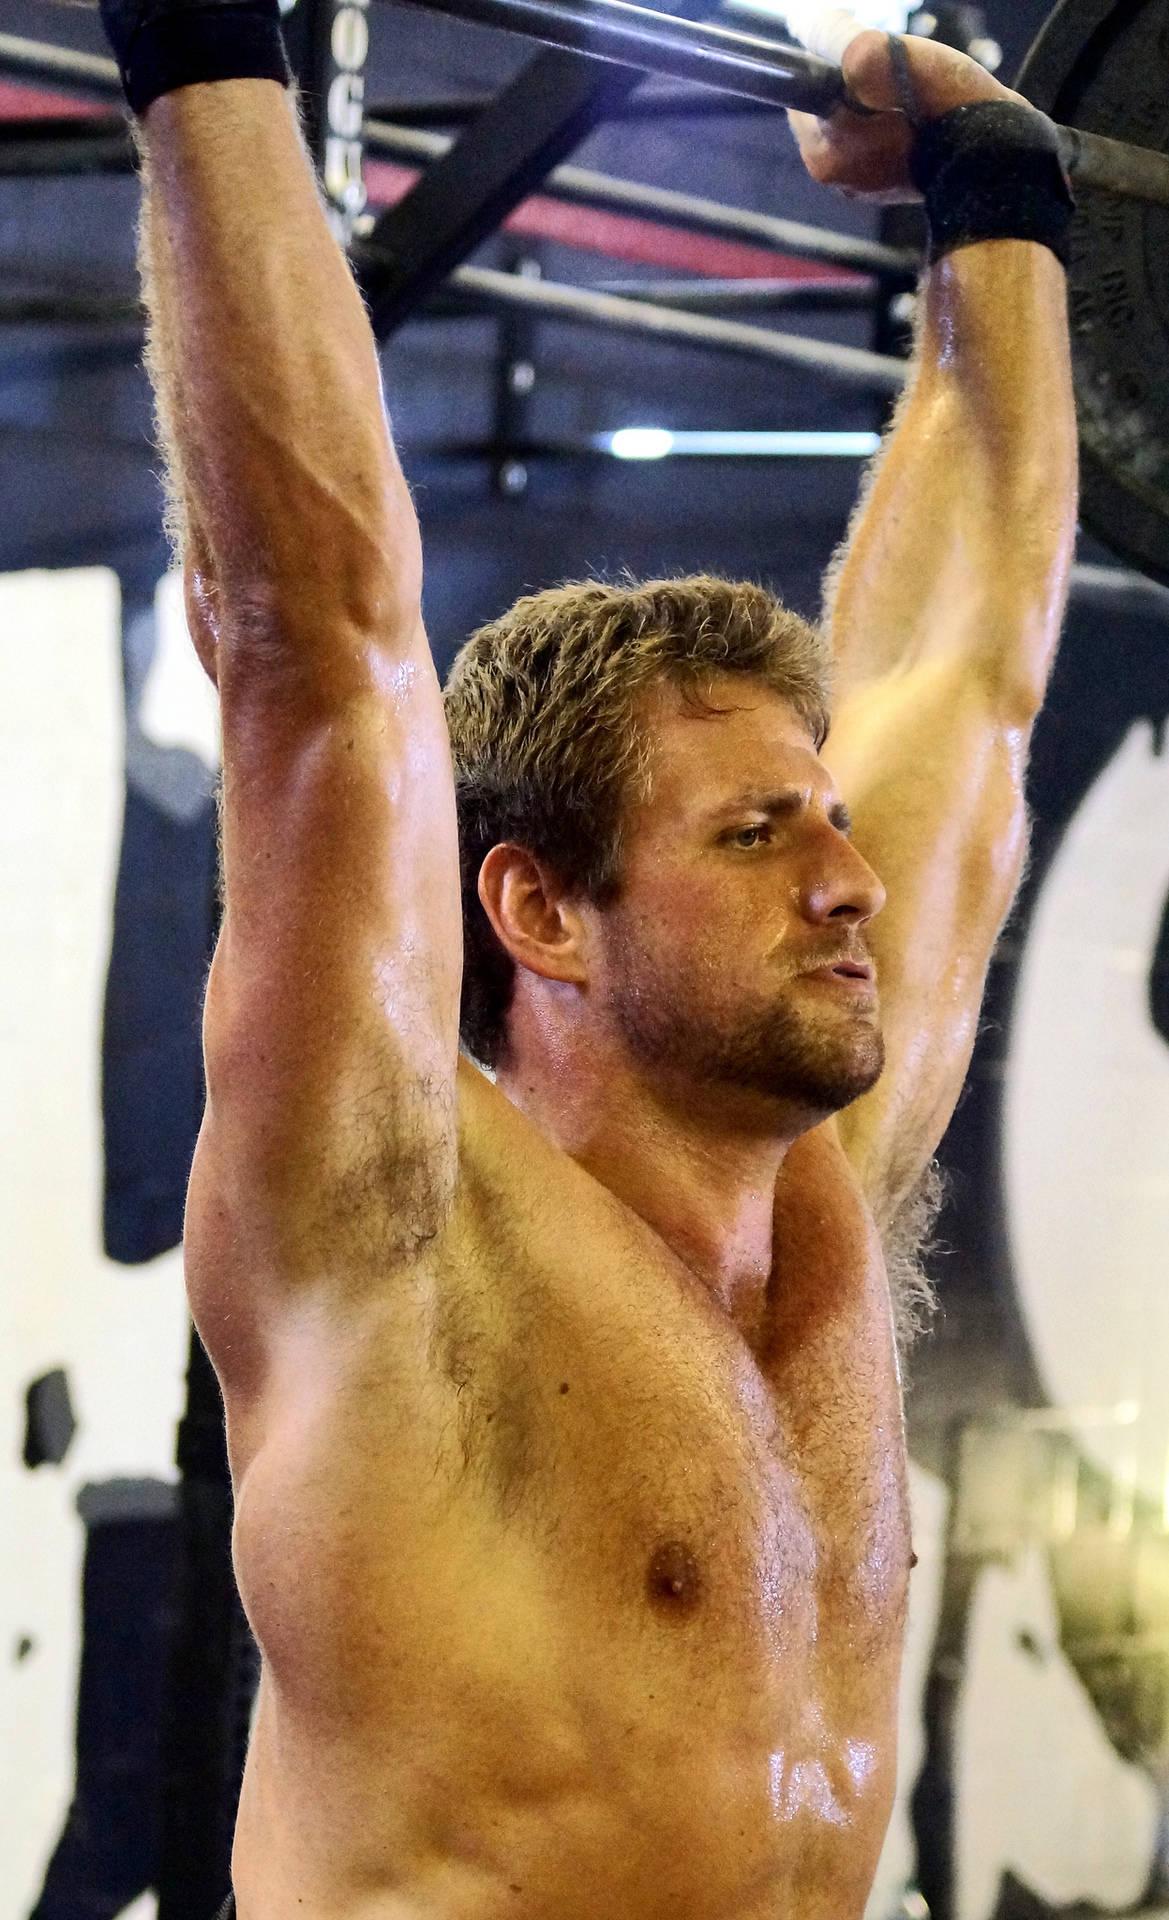 image Hairy men armpits photos gay the camera is